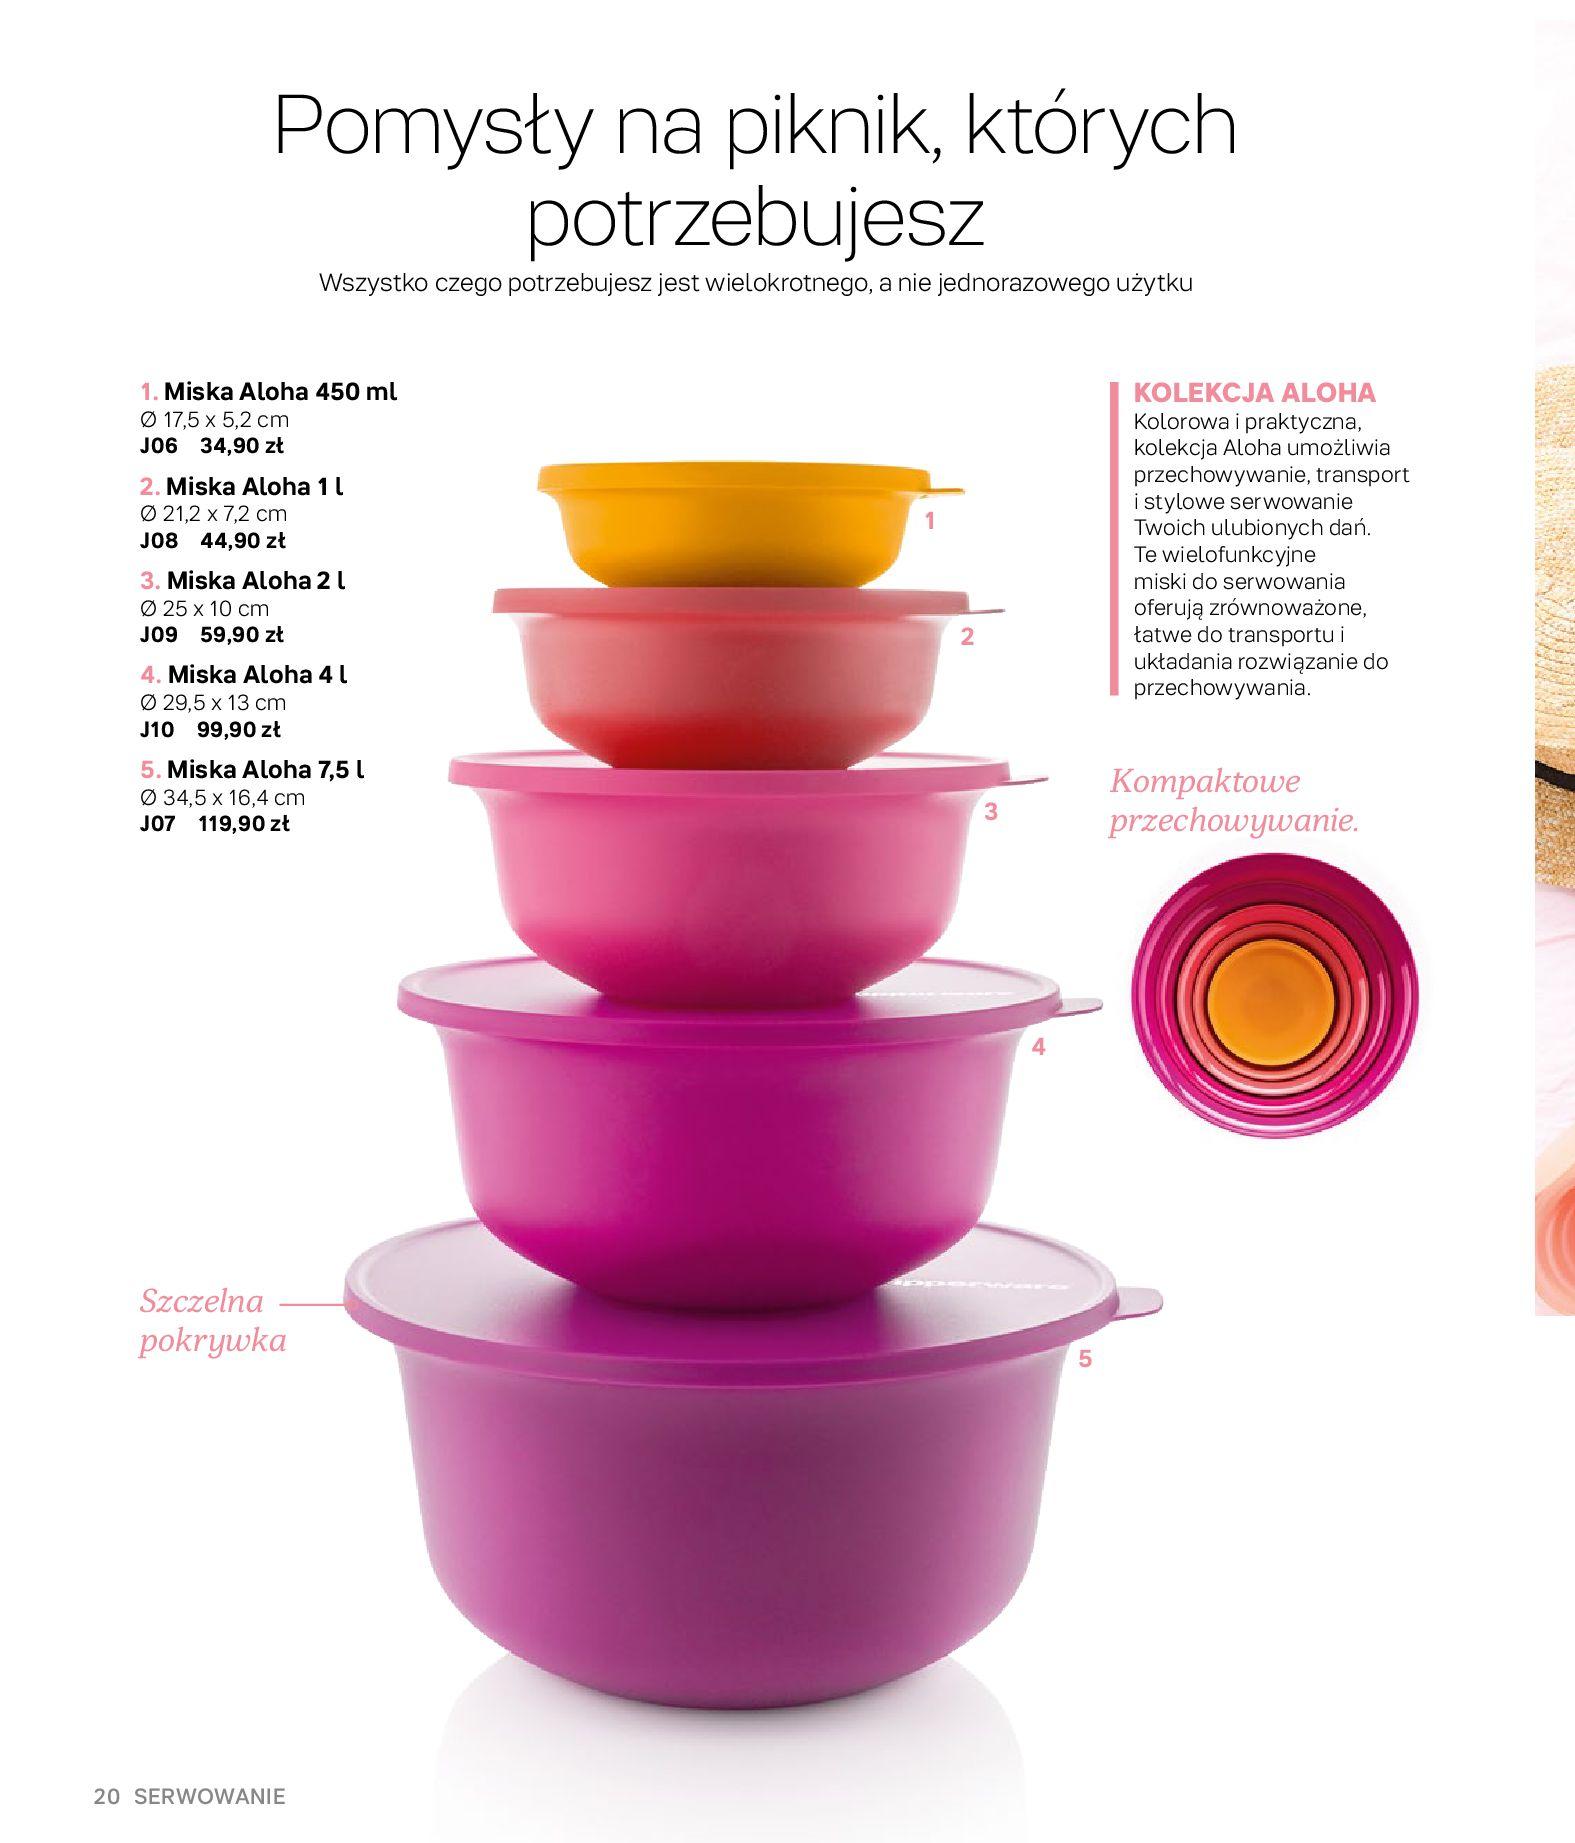 Gazetka Tupperware: Gazetka Tupperware - Katalog wiosna/ lato 2021-05-10 page-20